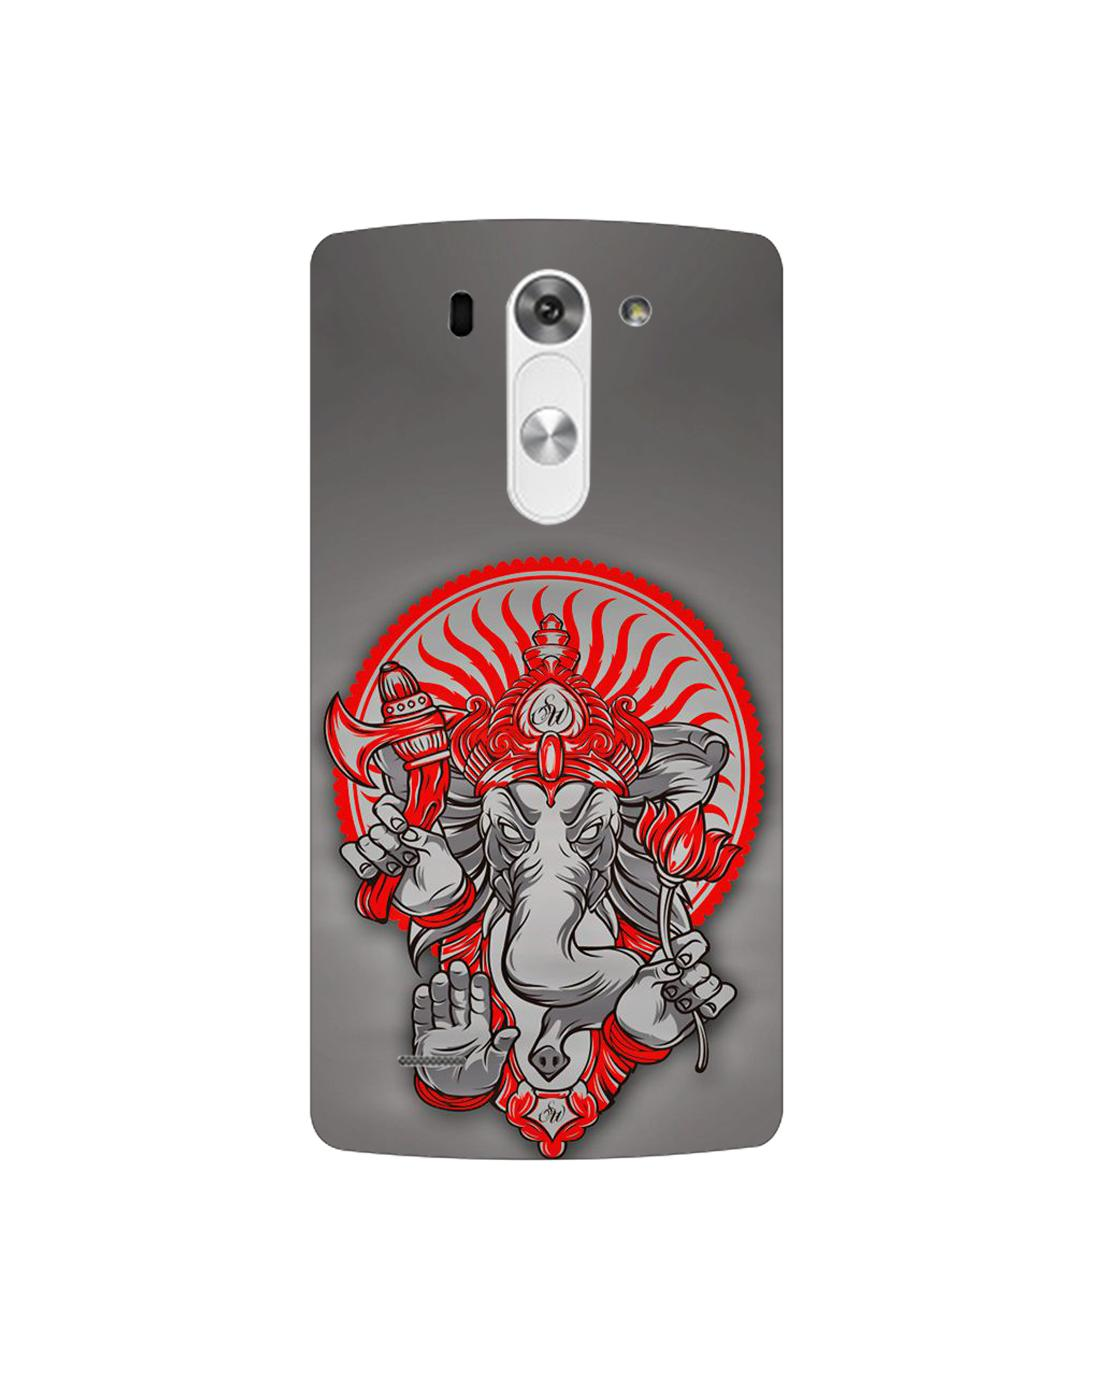 Buy Lgg3 Stylus Mobile Cover Hard Case Printed Back Cover Angry Ganpati Bappa Theme Designer